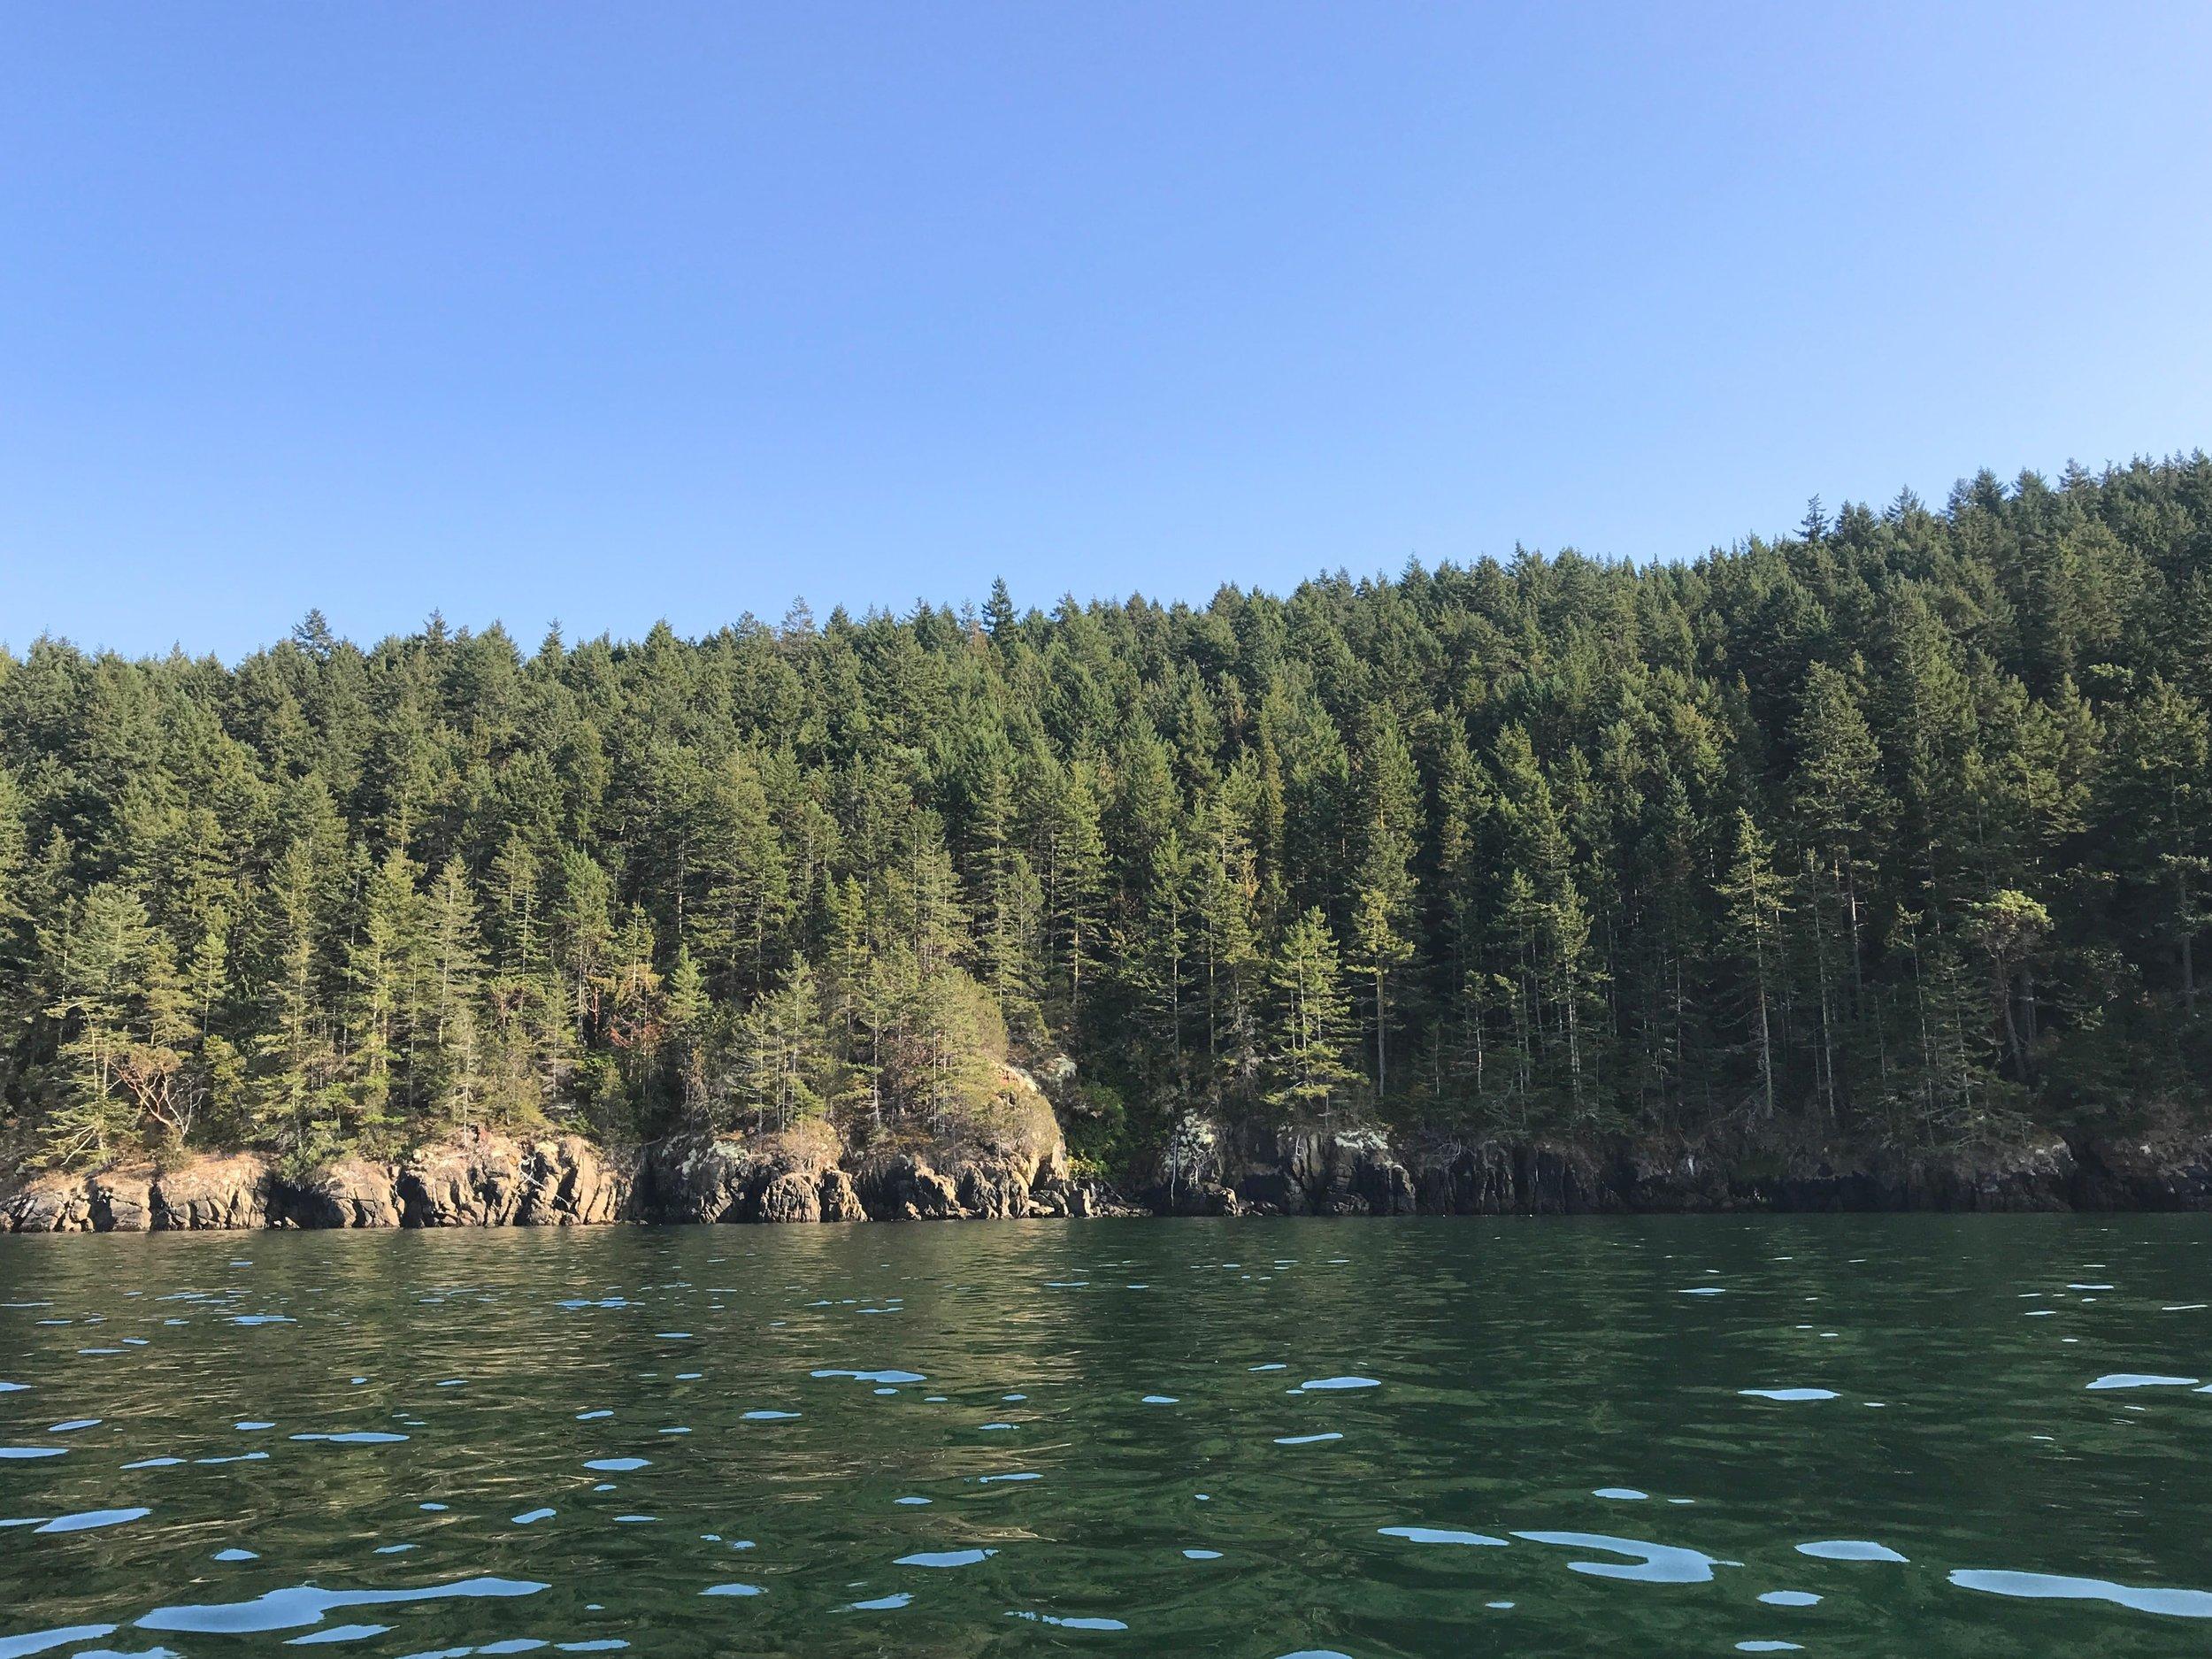 Burrows Island